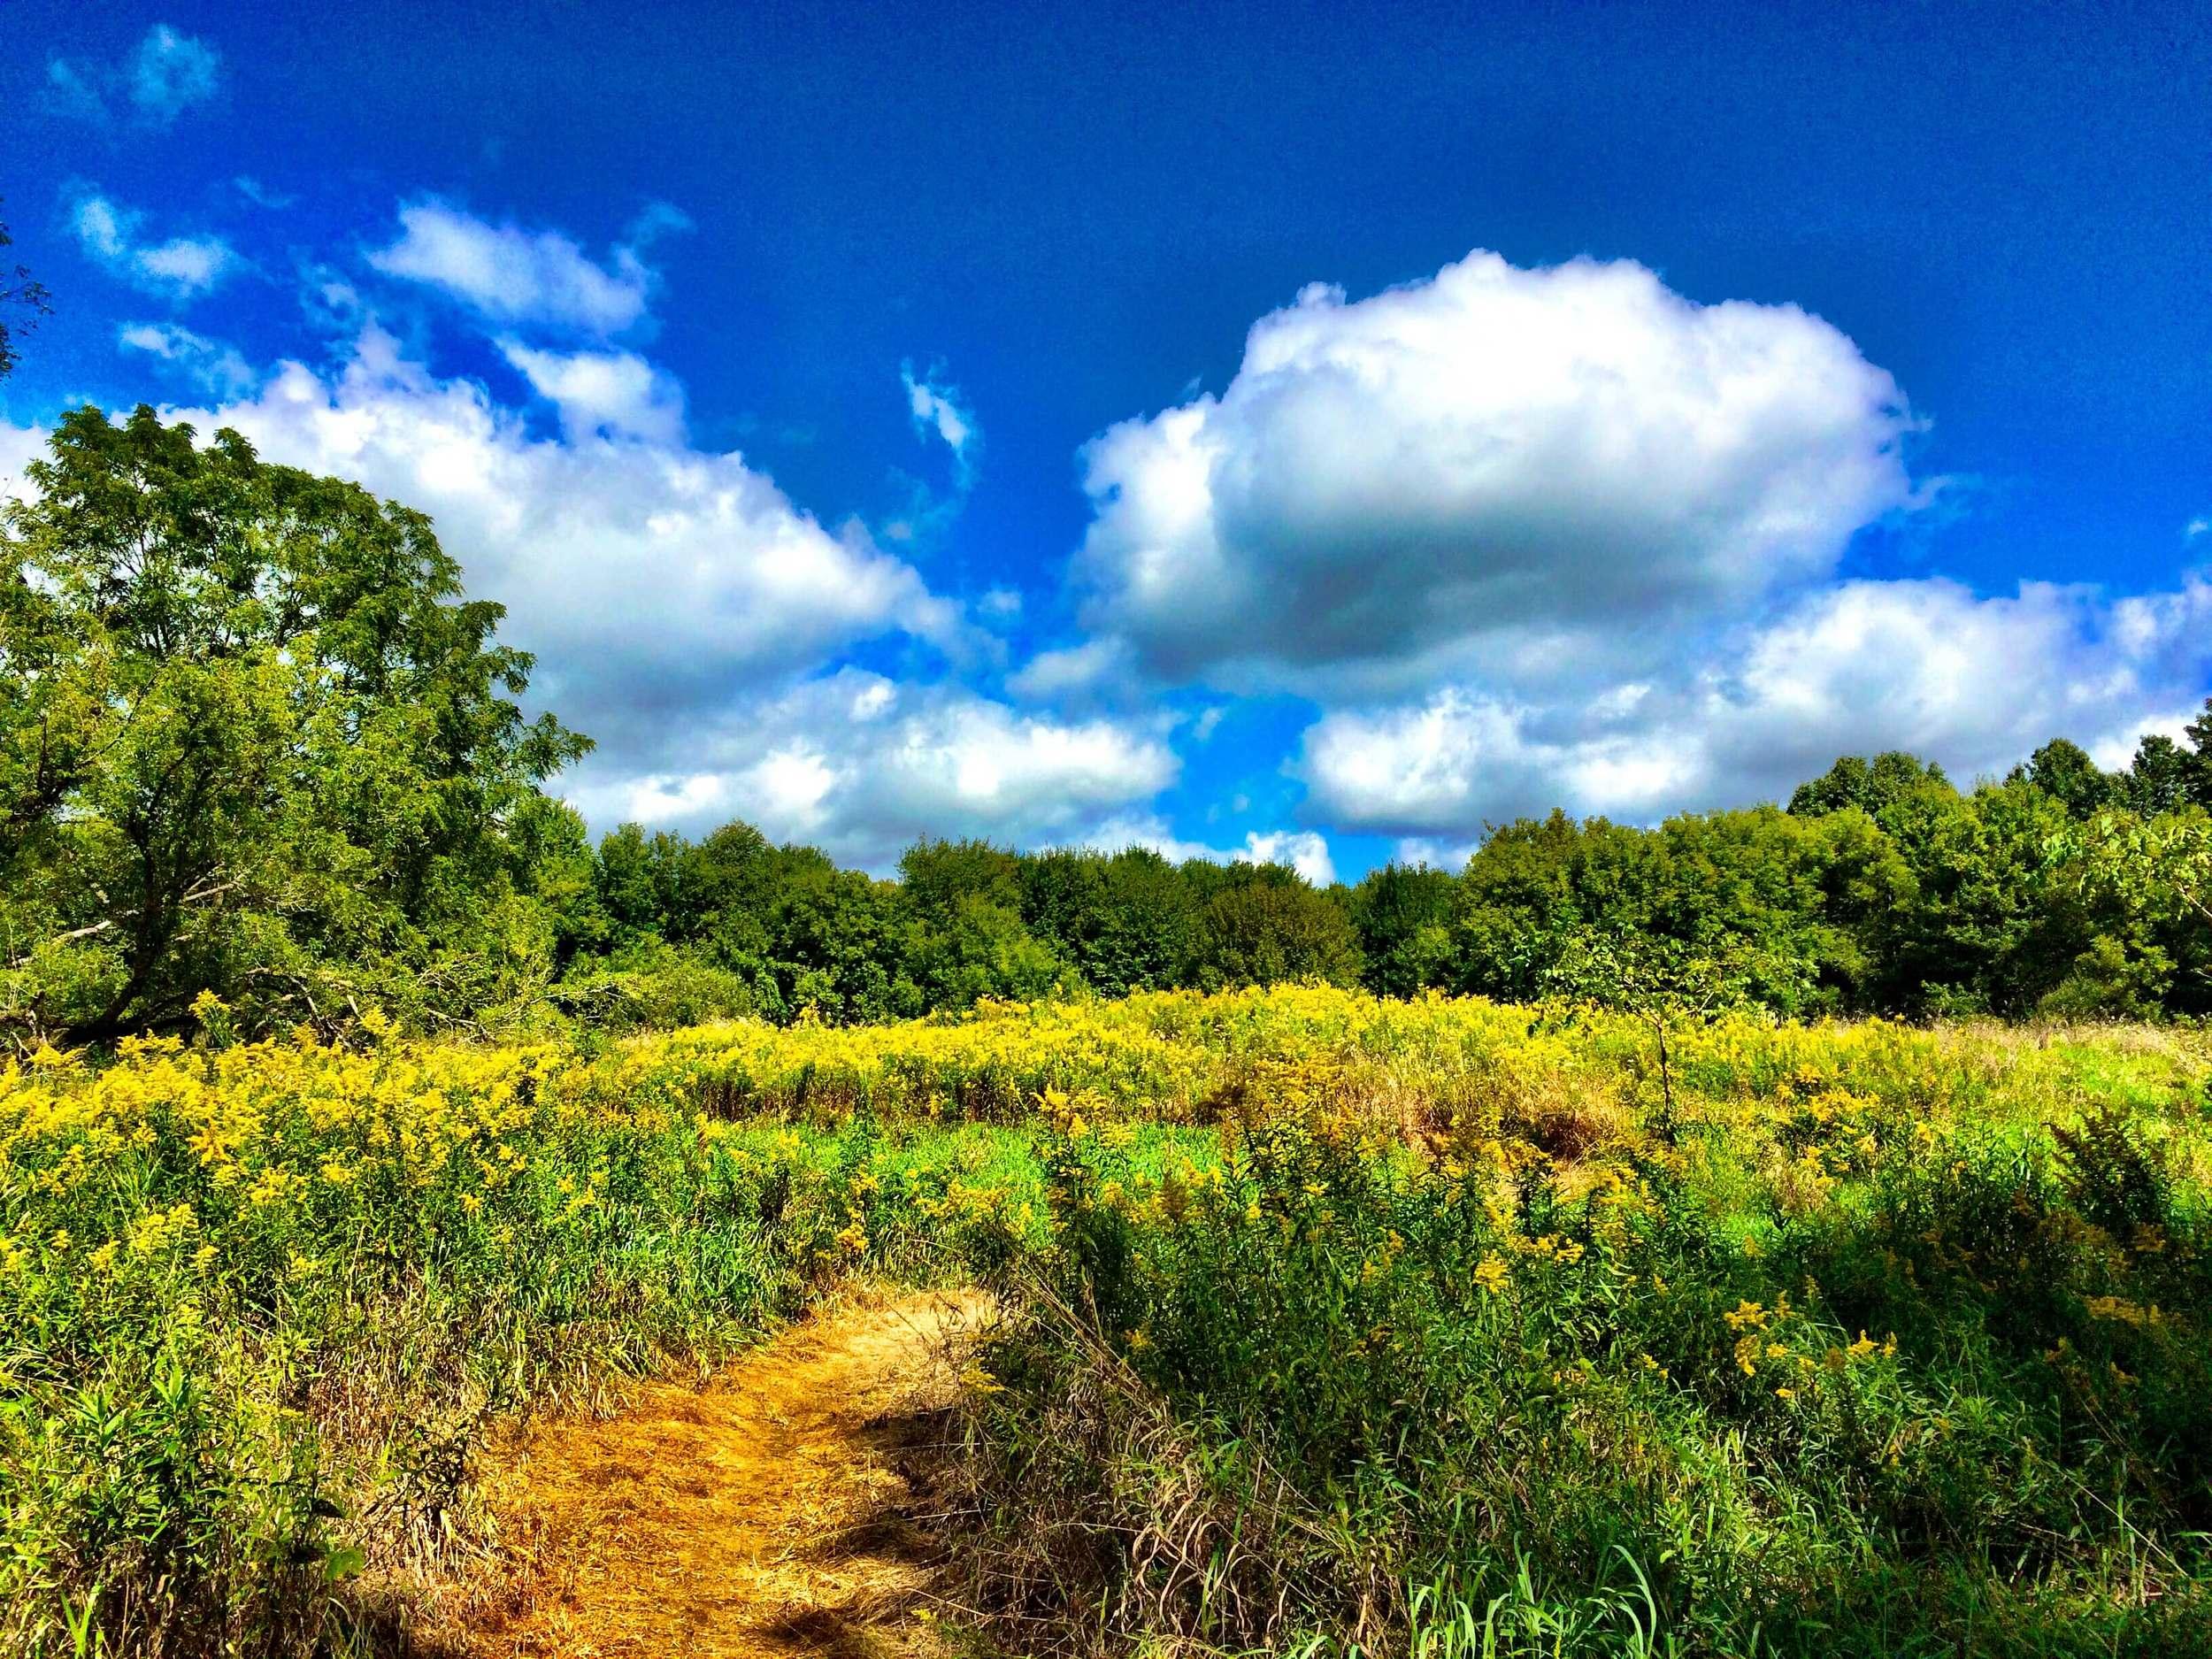 Sleepy Hollow State Park, Michigan, July 2015